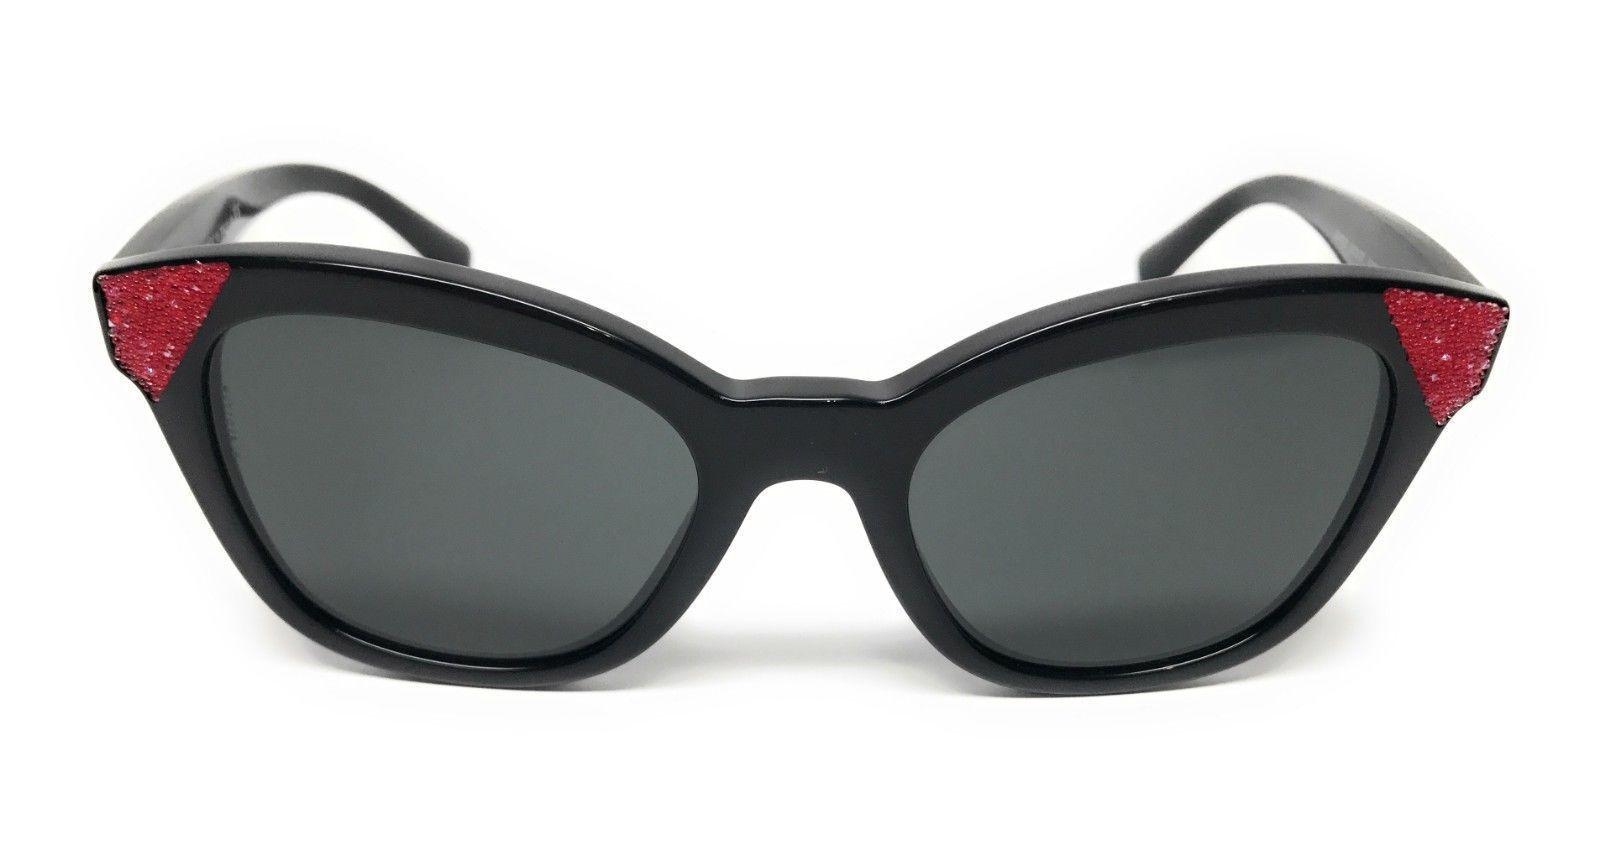 296ed46f16 NEW VALENTINO VA 4005 5012 87 BLACK AUTHENTIC SUNGLASSES ITALY 52-20 140 3N  USA -  127.71 · Advanced search for Valentino Eyeglass Frame